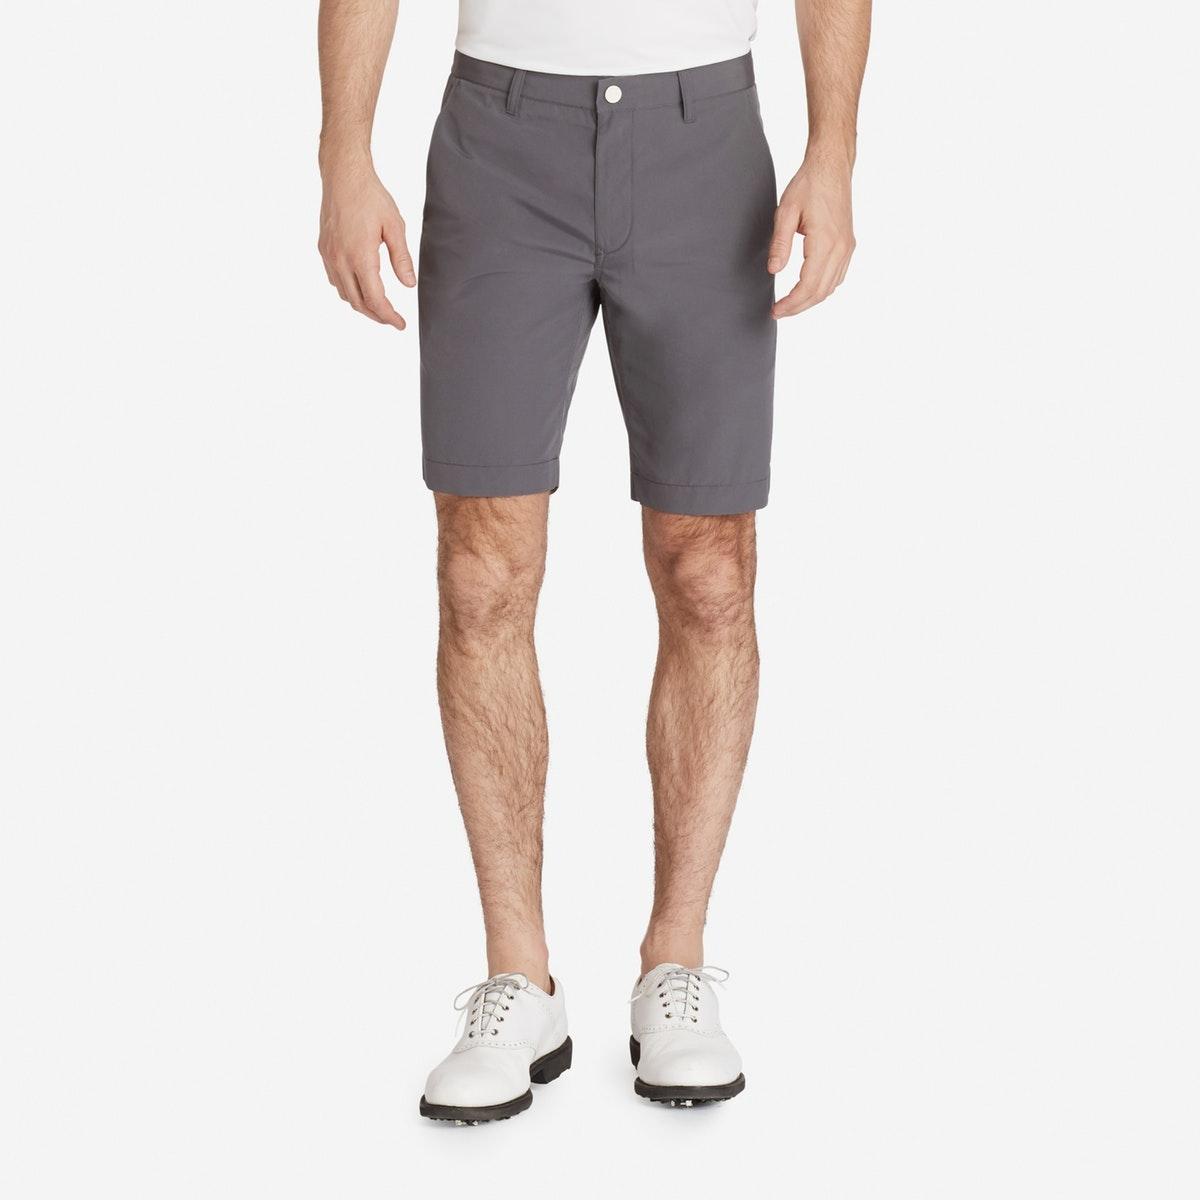 Highland Lightweight Golf Shorts